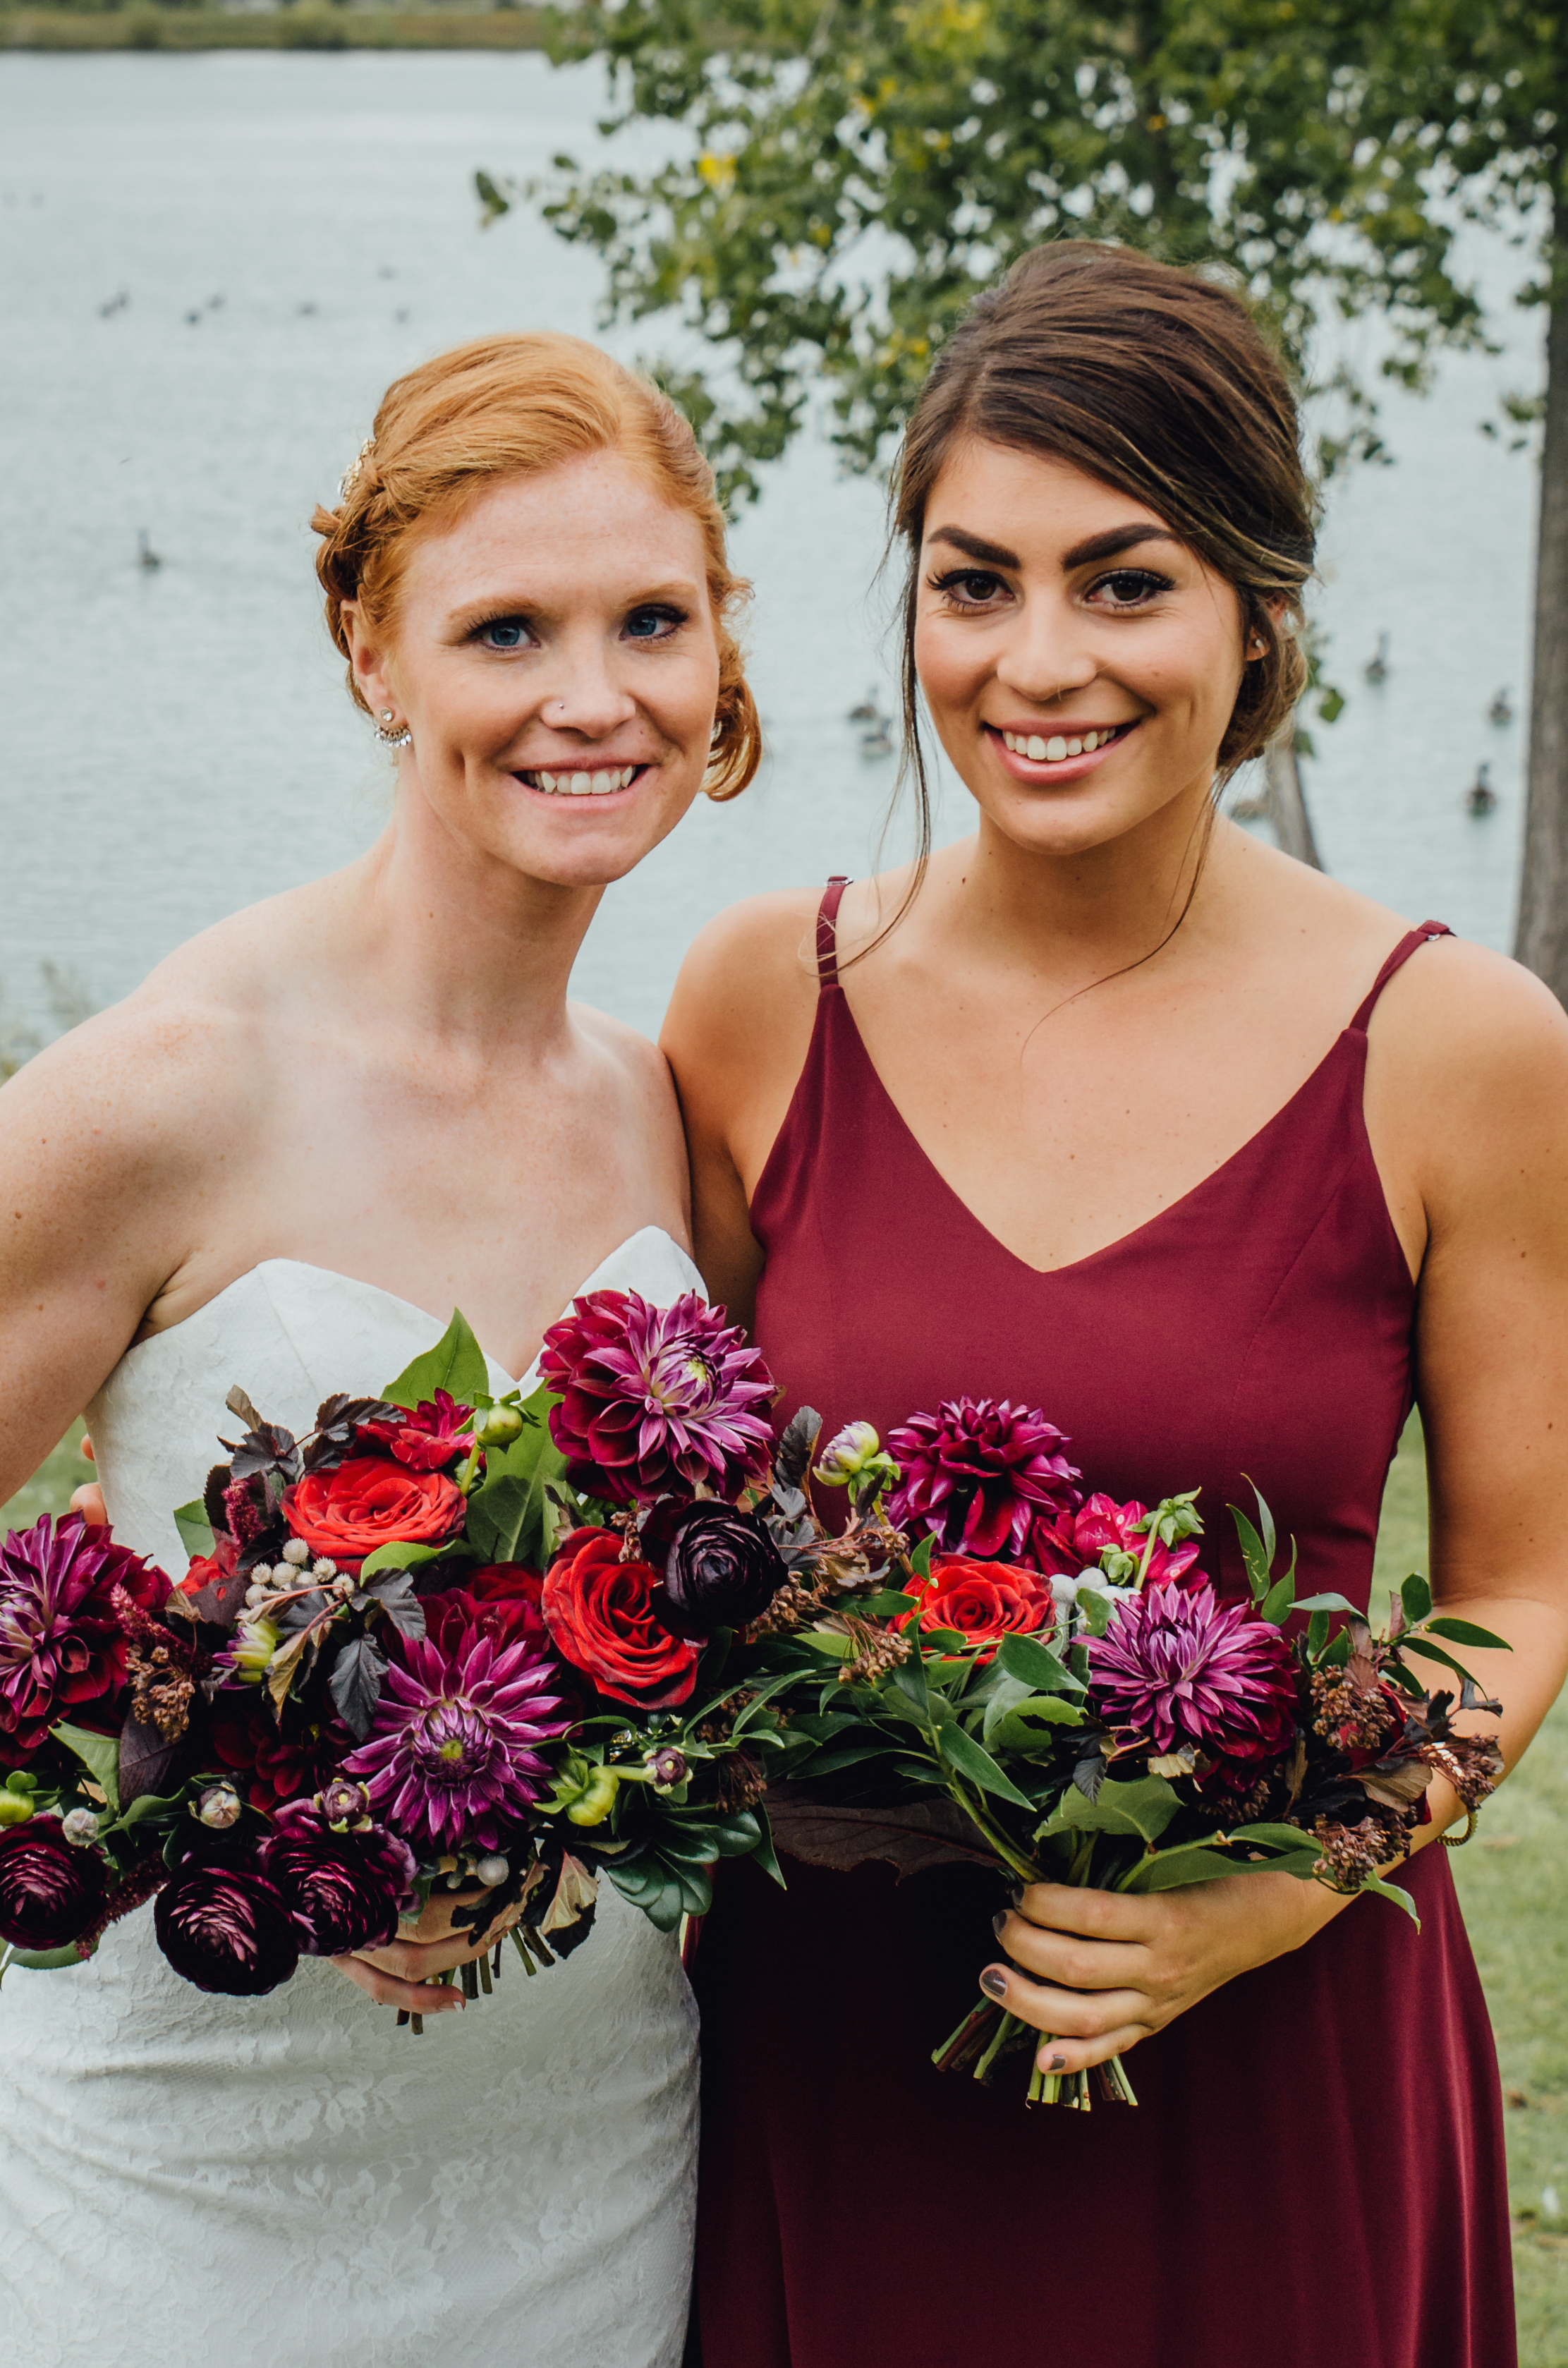 Burgundy Bridesmaid Dress - Winnipeg Wedding Flowers